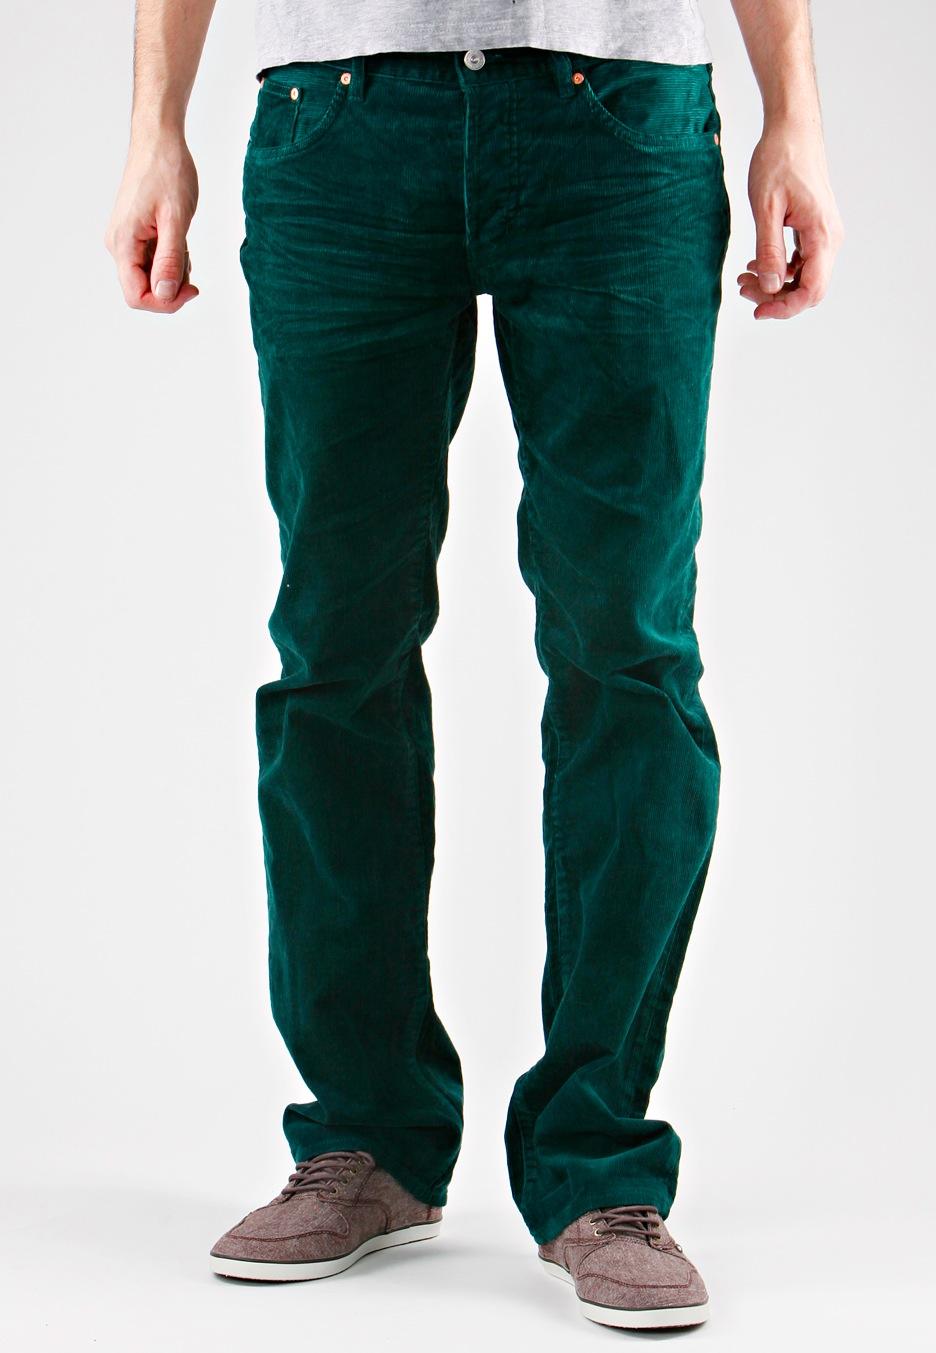 Wesc - Wesc Slim 5 Pocket Moss Green Cord - Pants - Streetwear ...